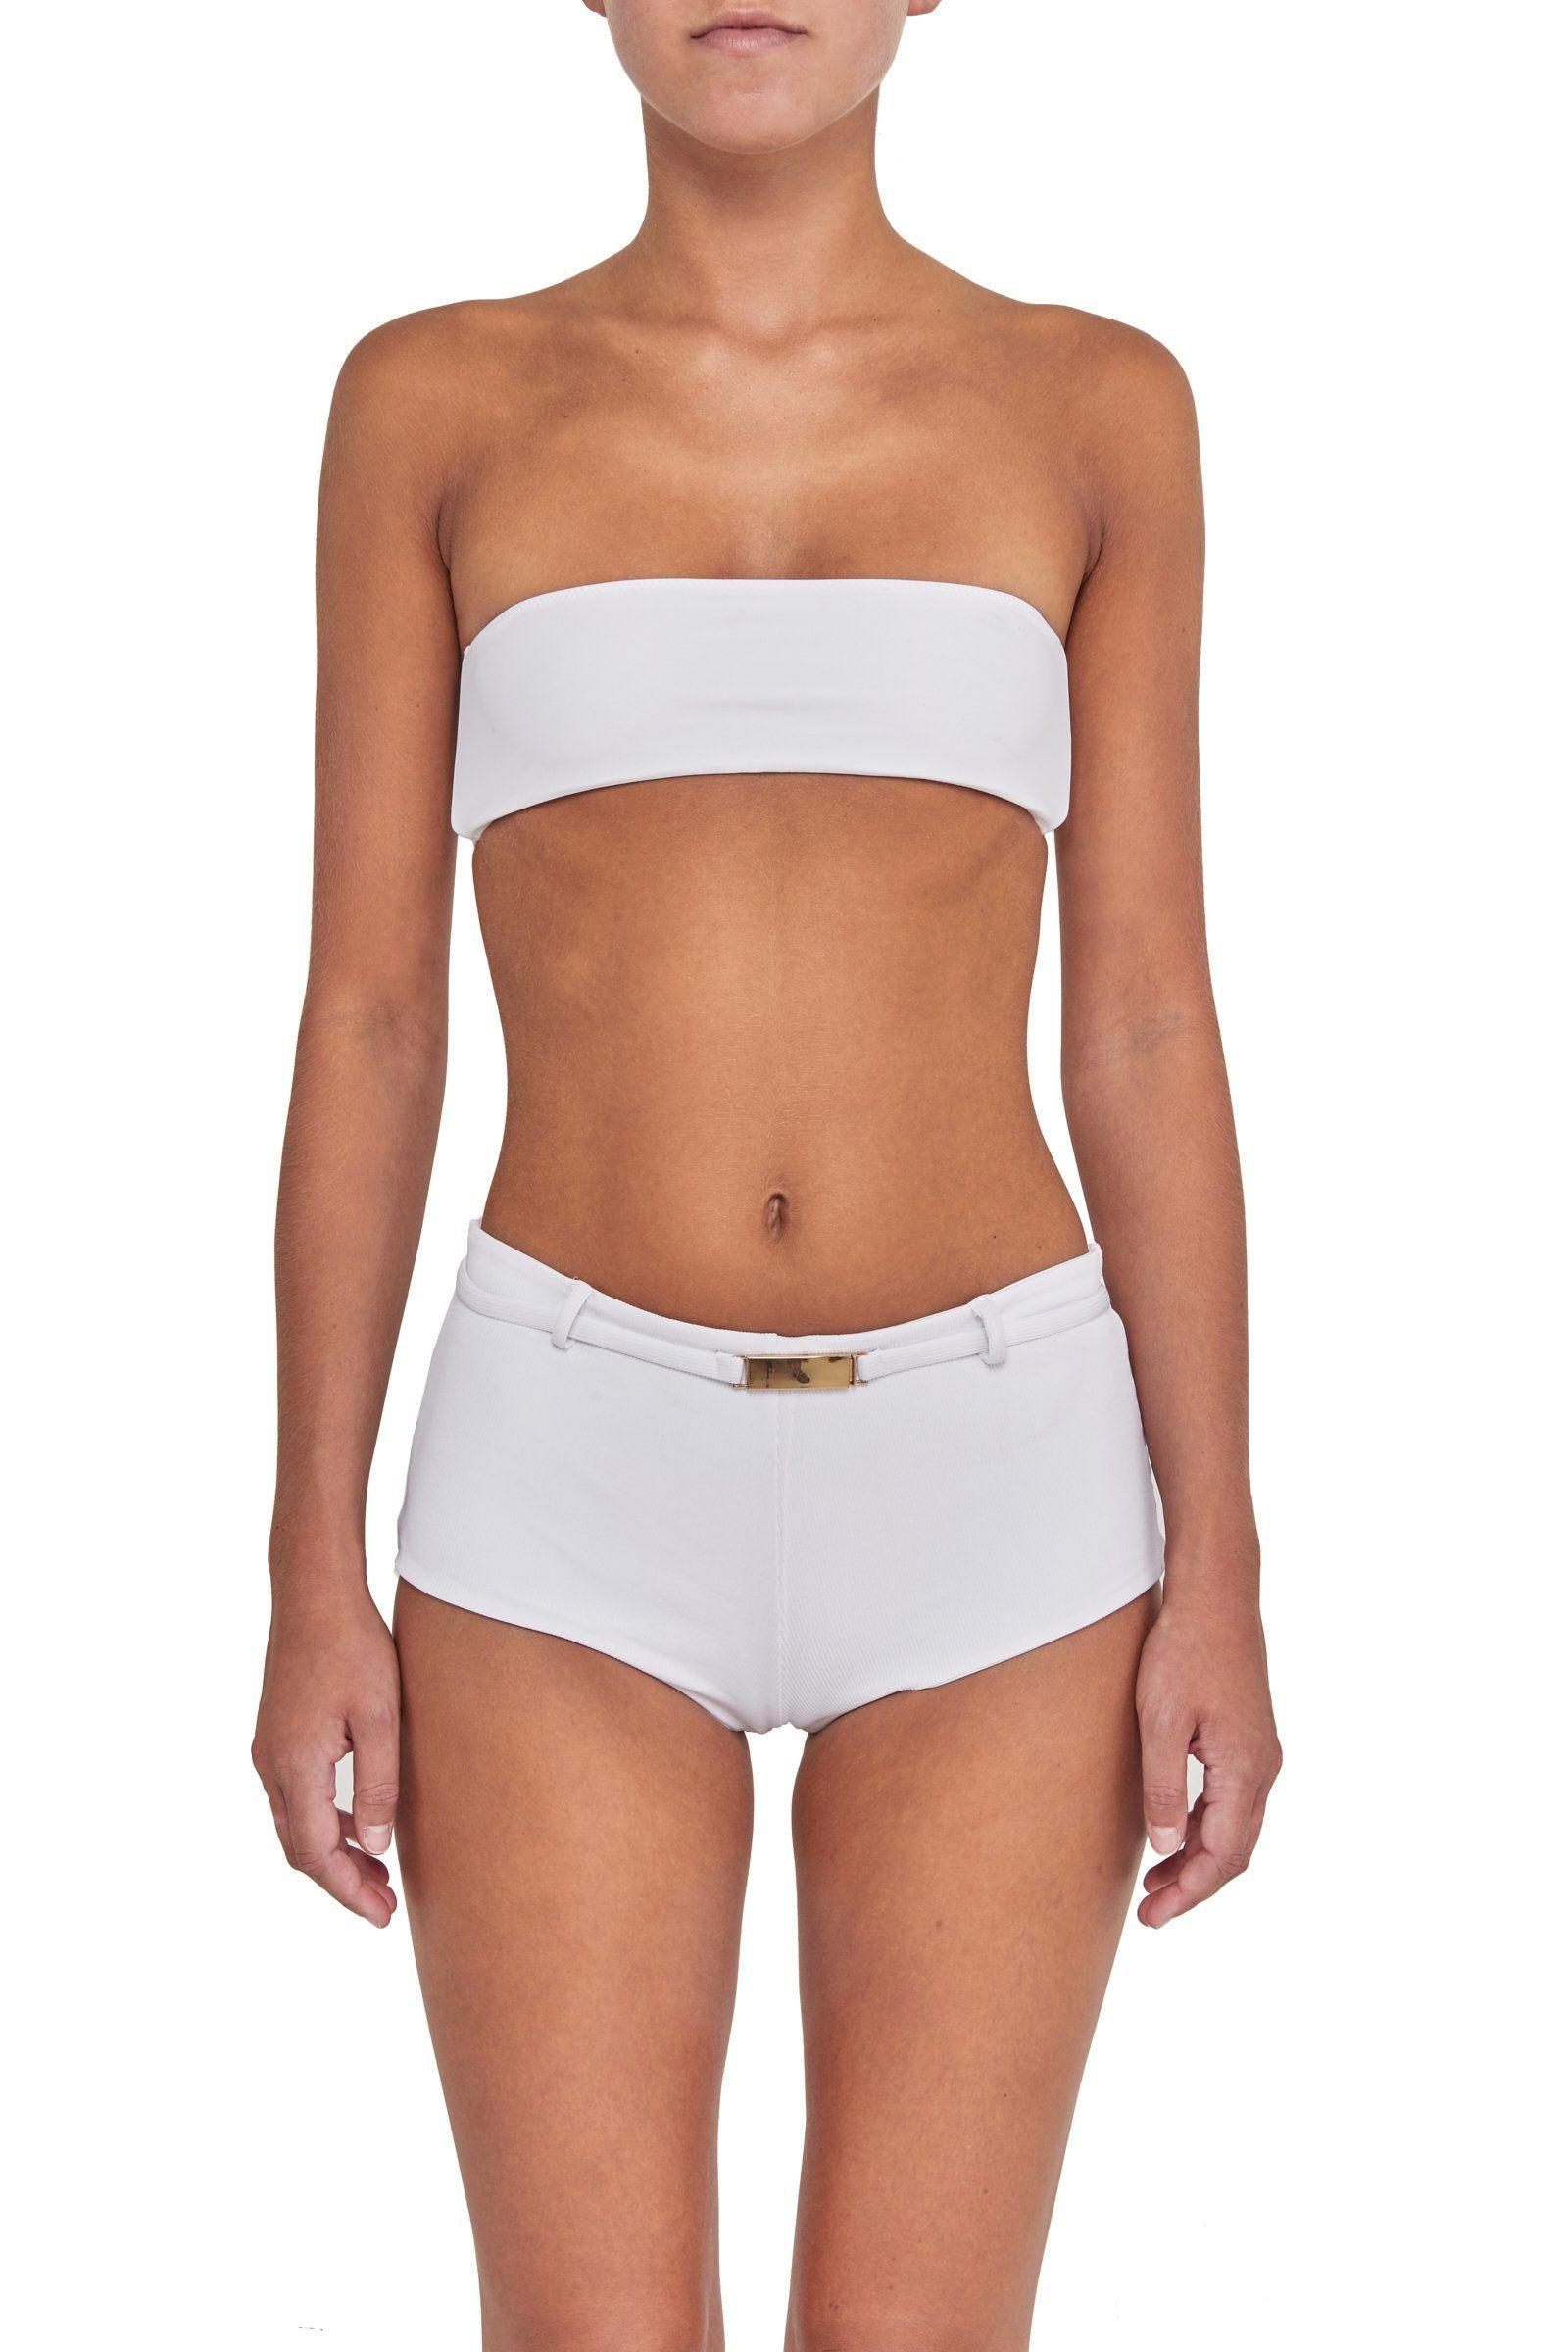 types of bikini bottoms 293192 1621302592524